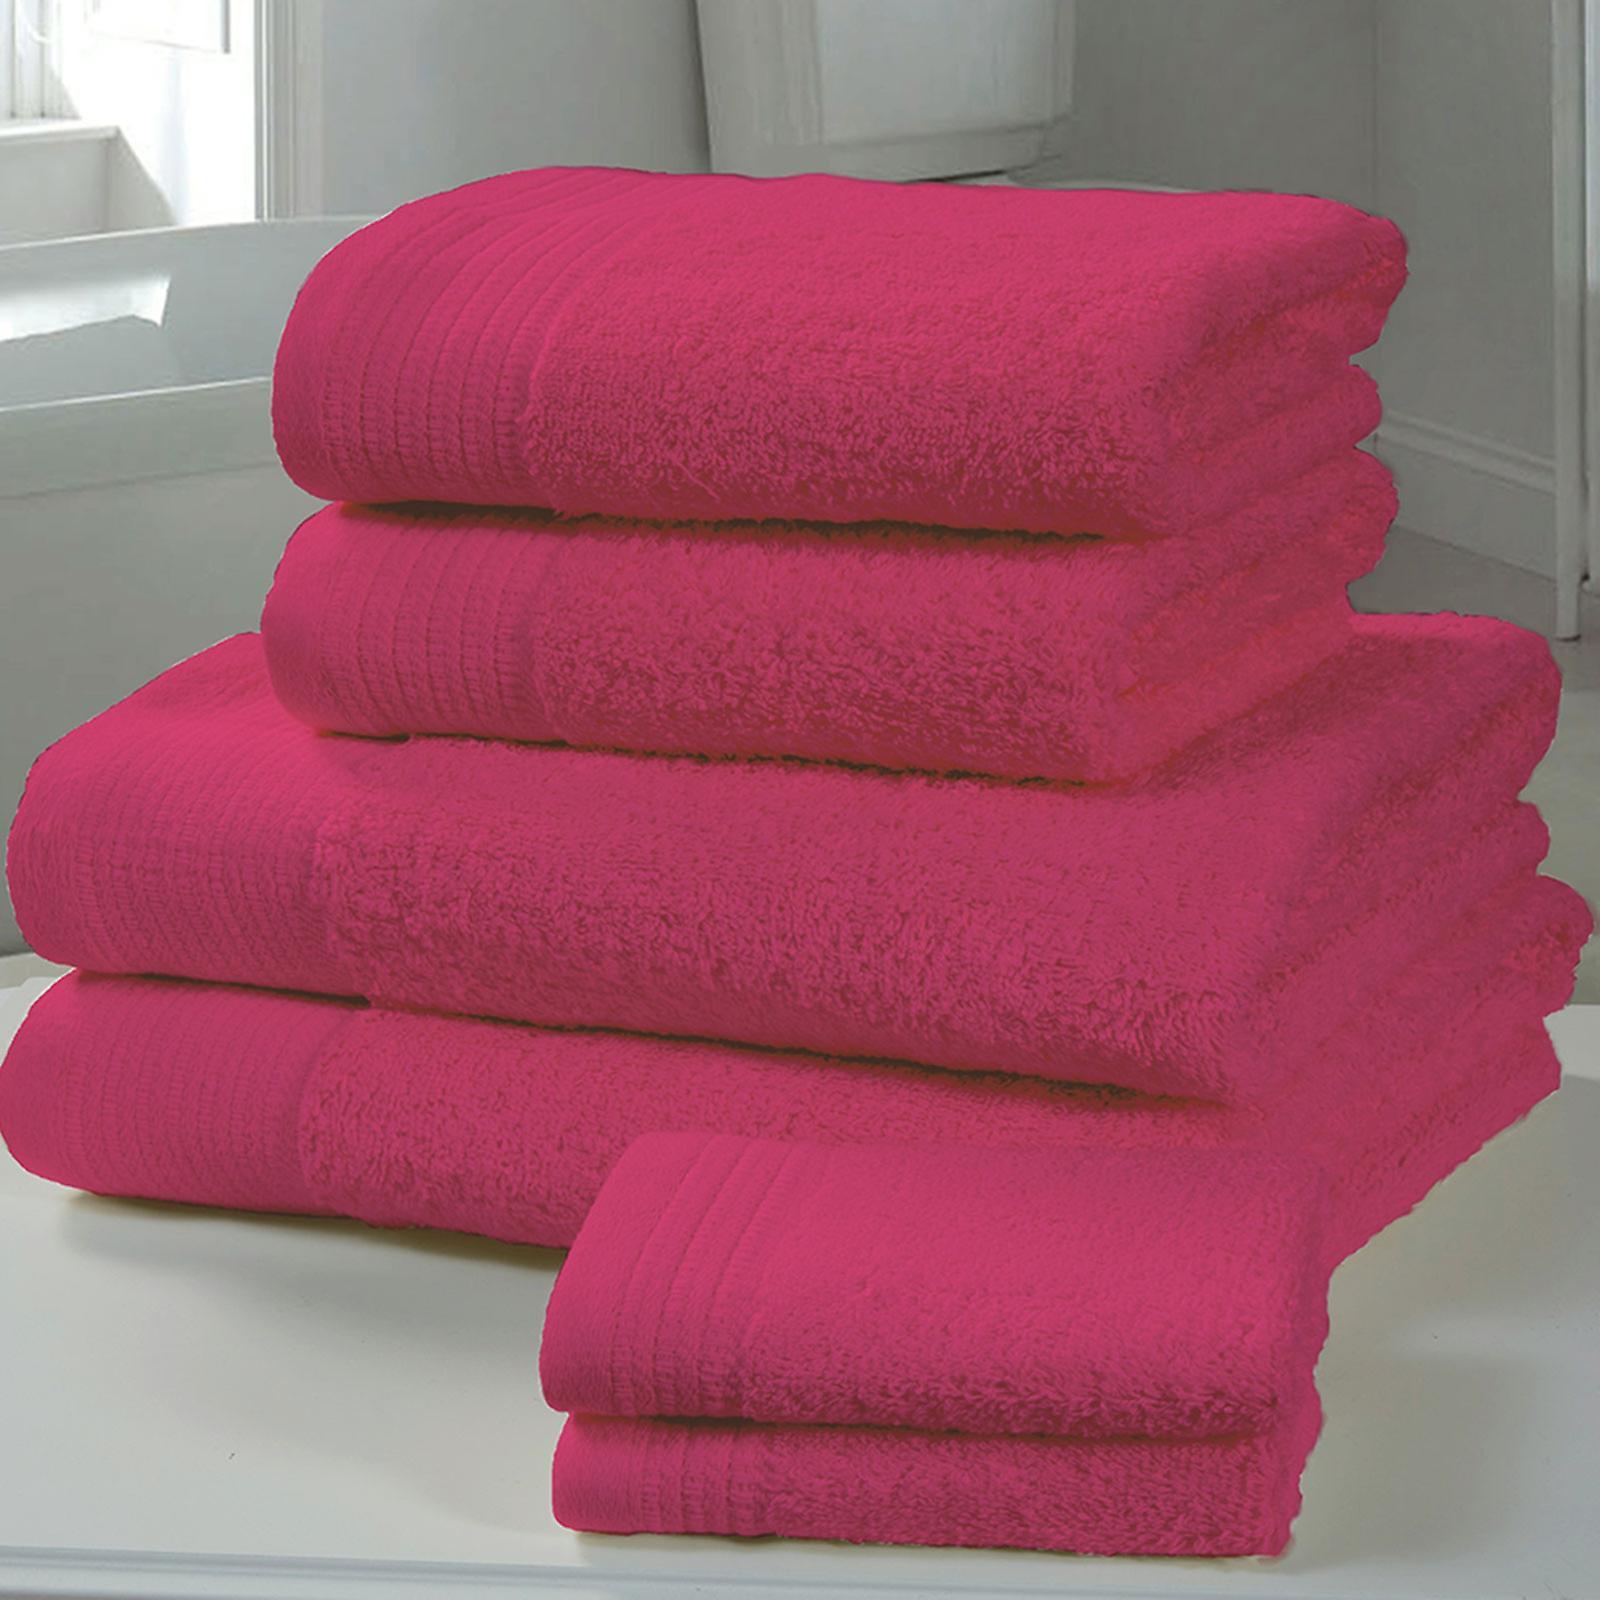 Chatsworth 4 Piece Towel Bale Fuschia- 2 Hand Towels, 2 Bath Towels